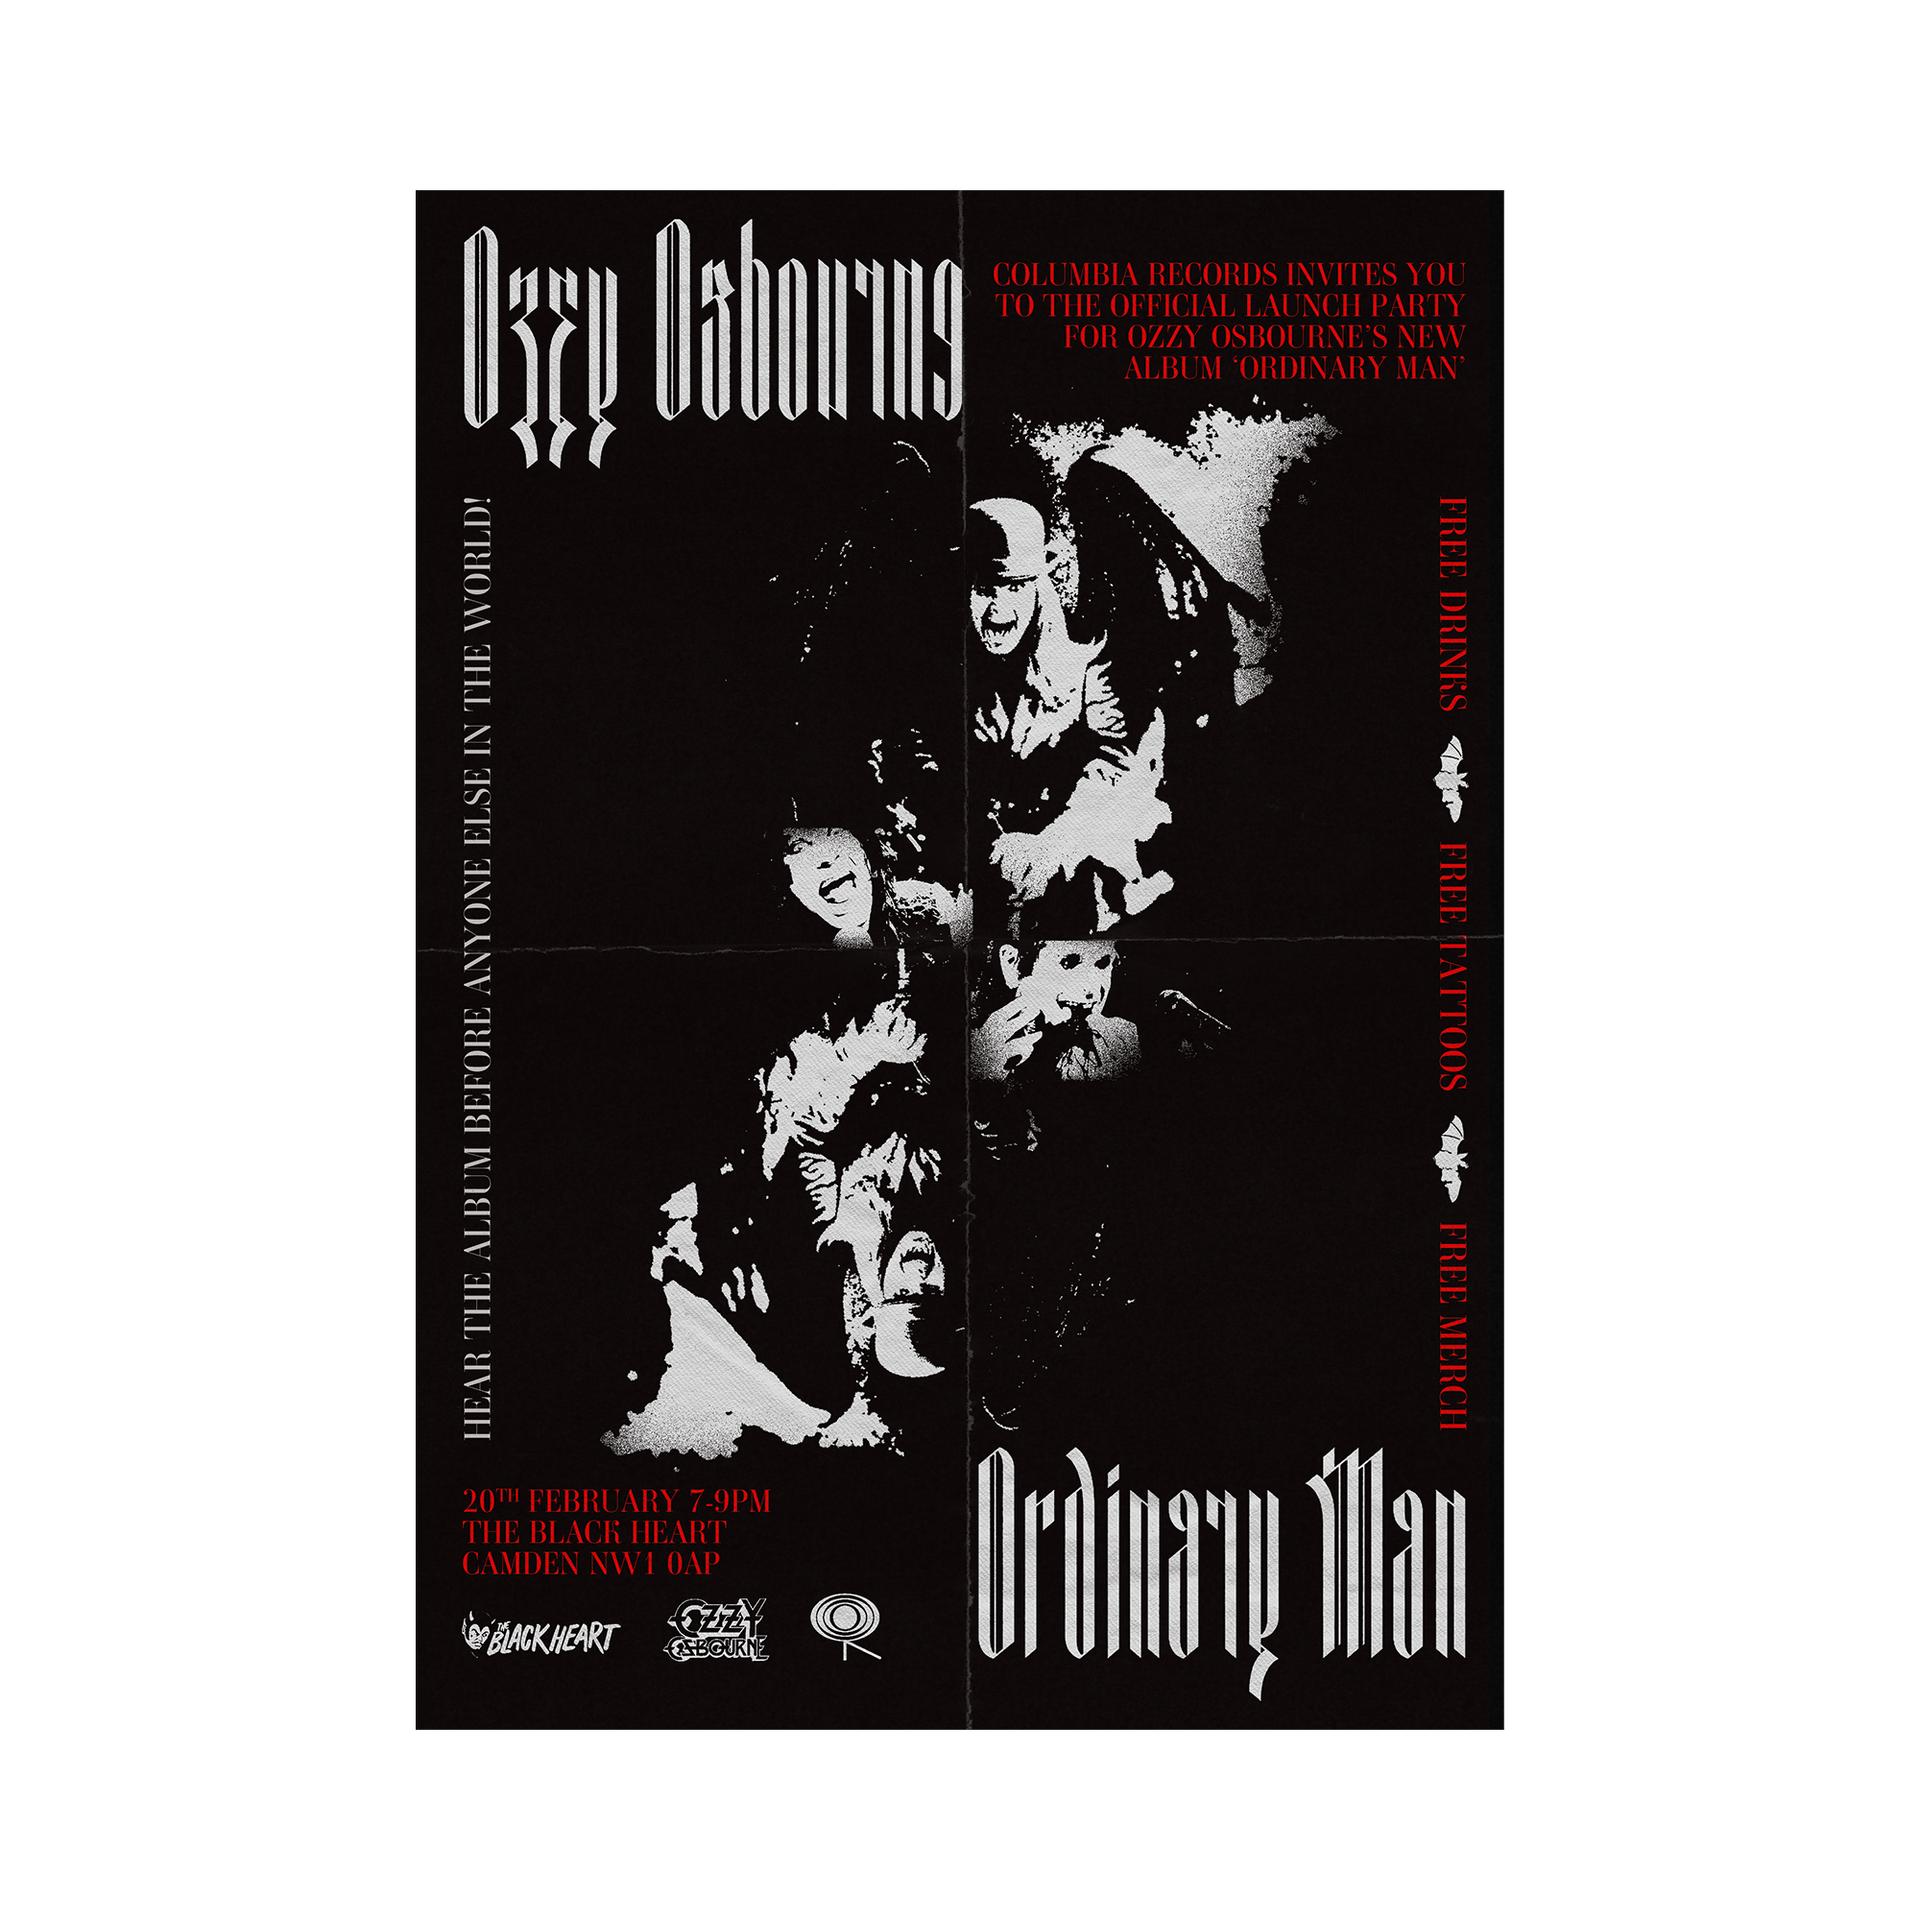 Invite for Ozzy Osbourne's album launch party